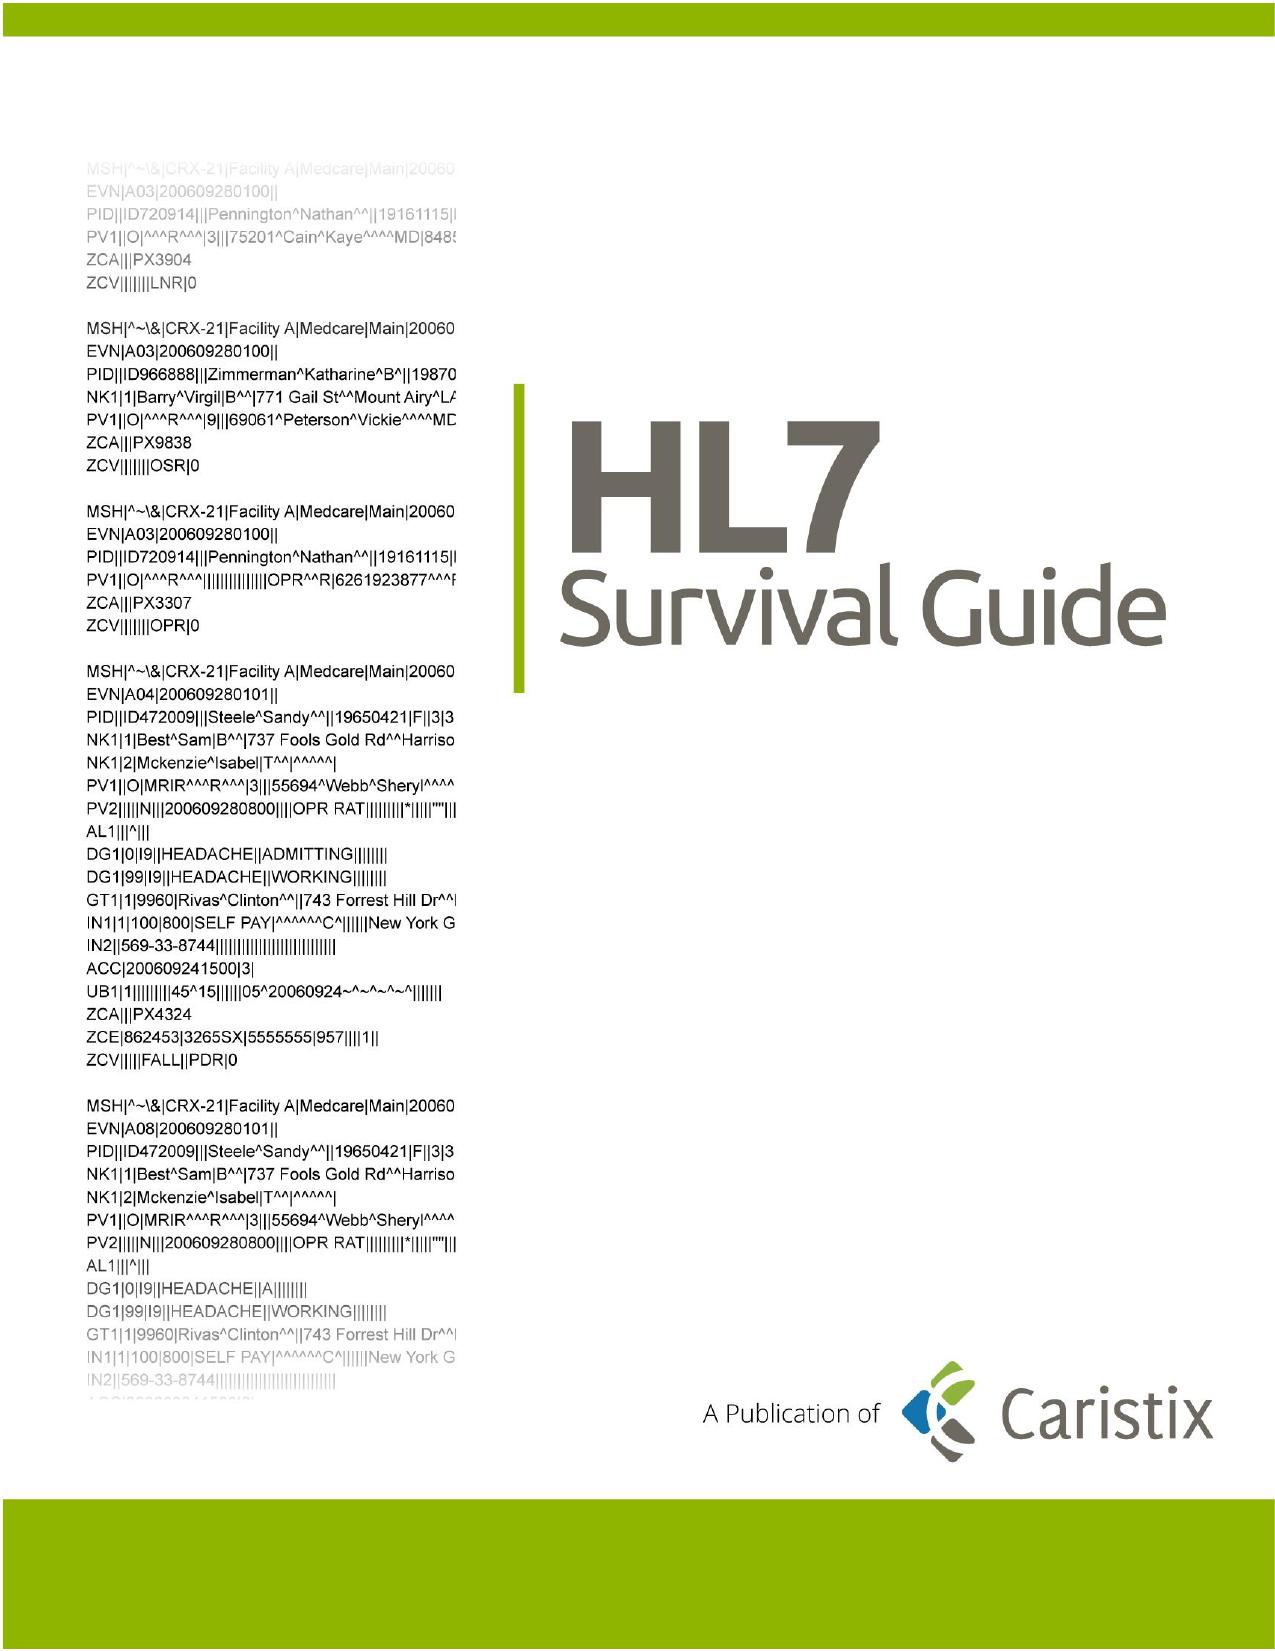 HL7 Survival Guide   manualzz com